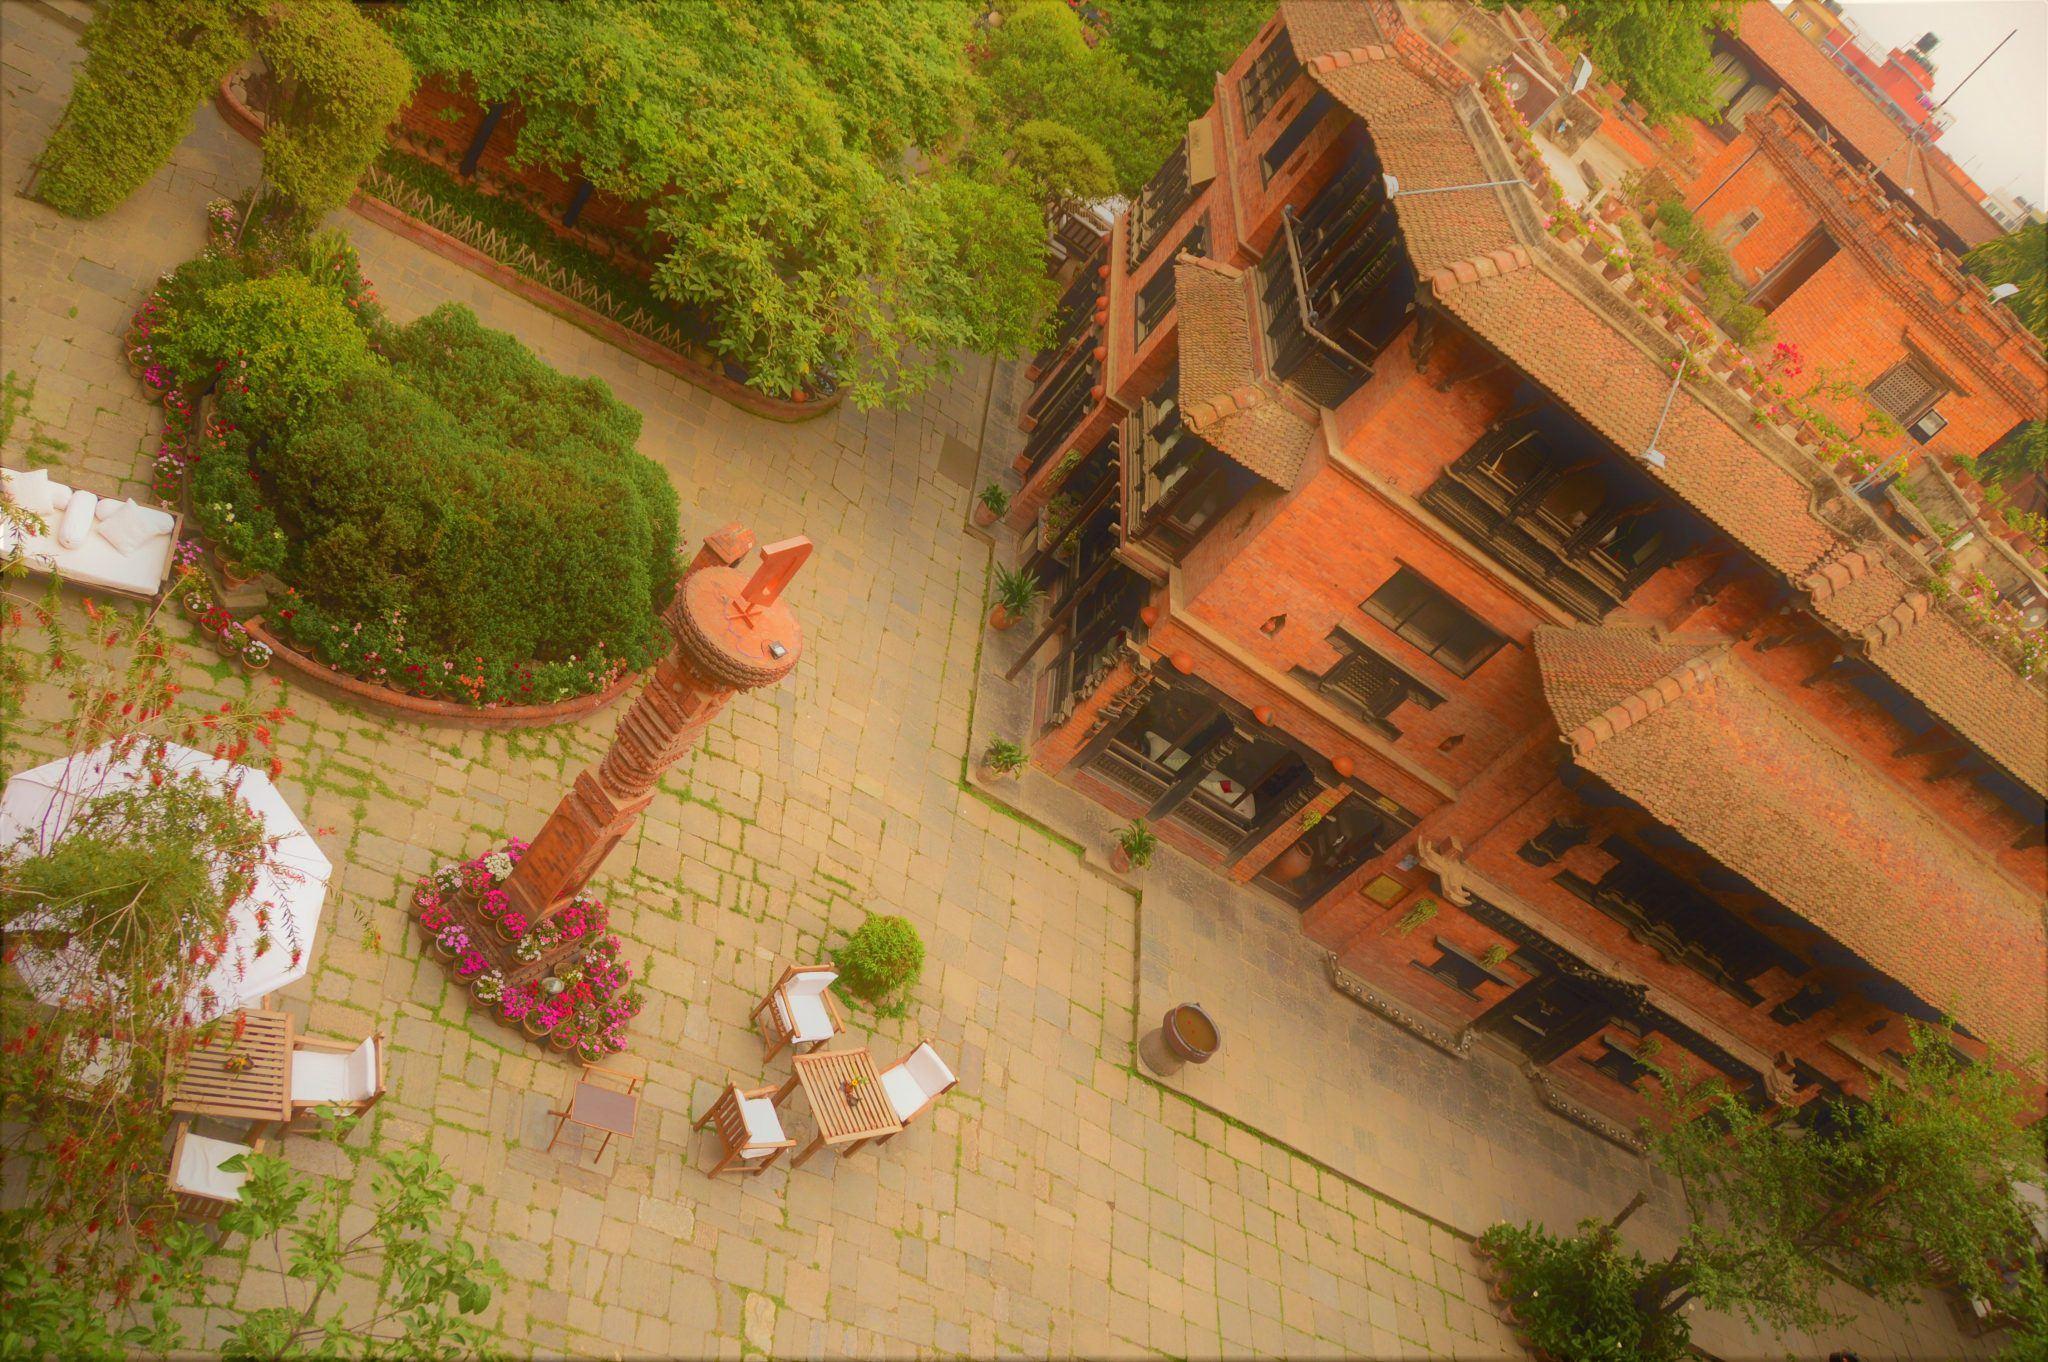 dwarika's hotel in kathmandu courtyard